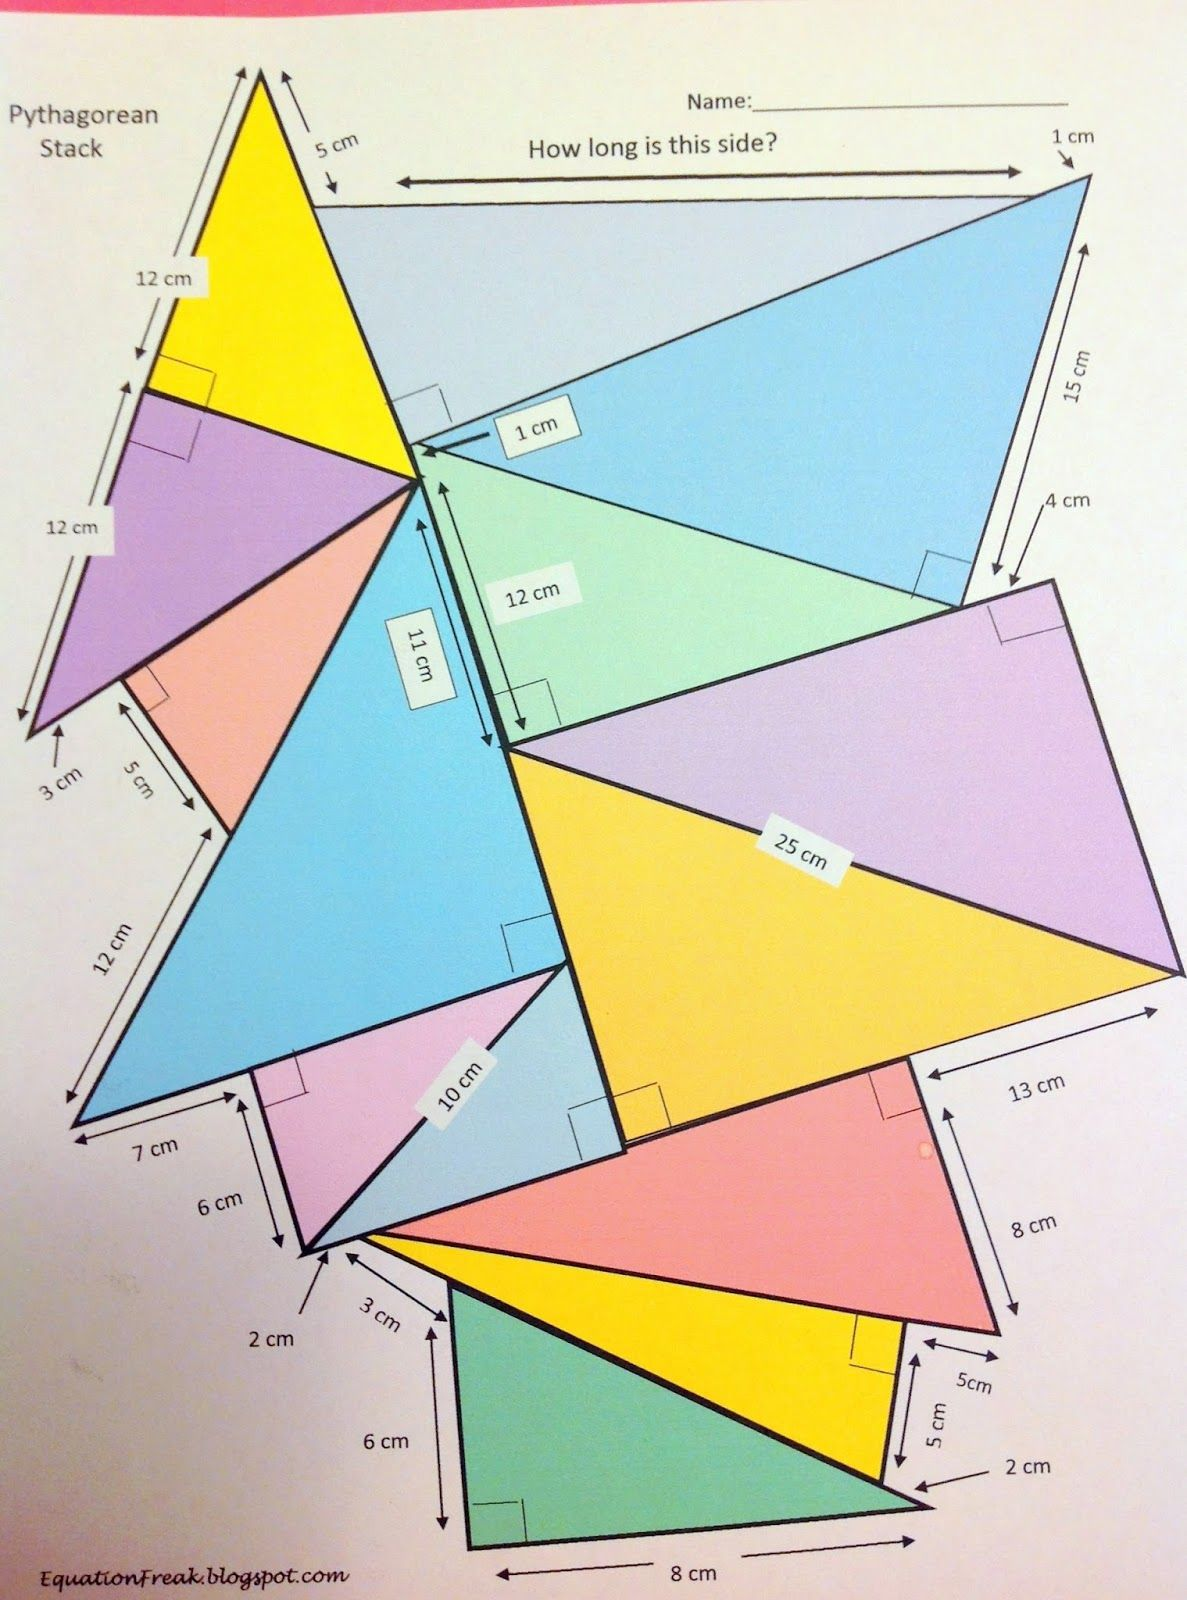 Equationfreak Blogspot Search Label Pythagorean